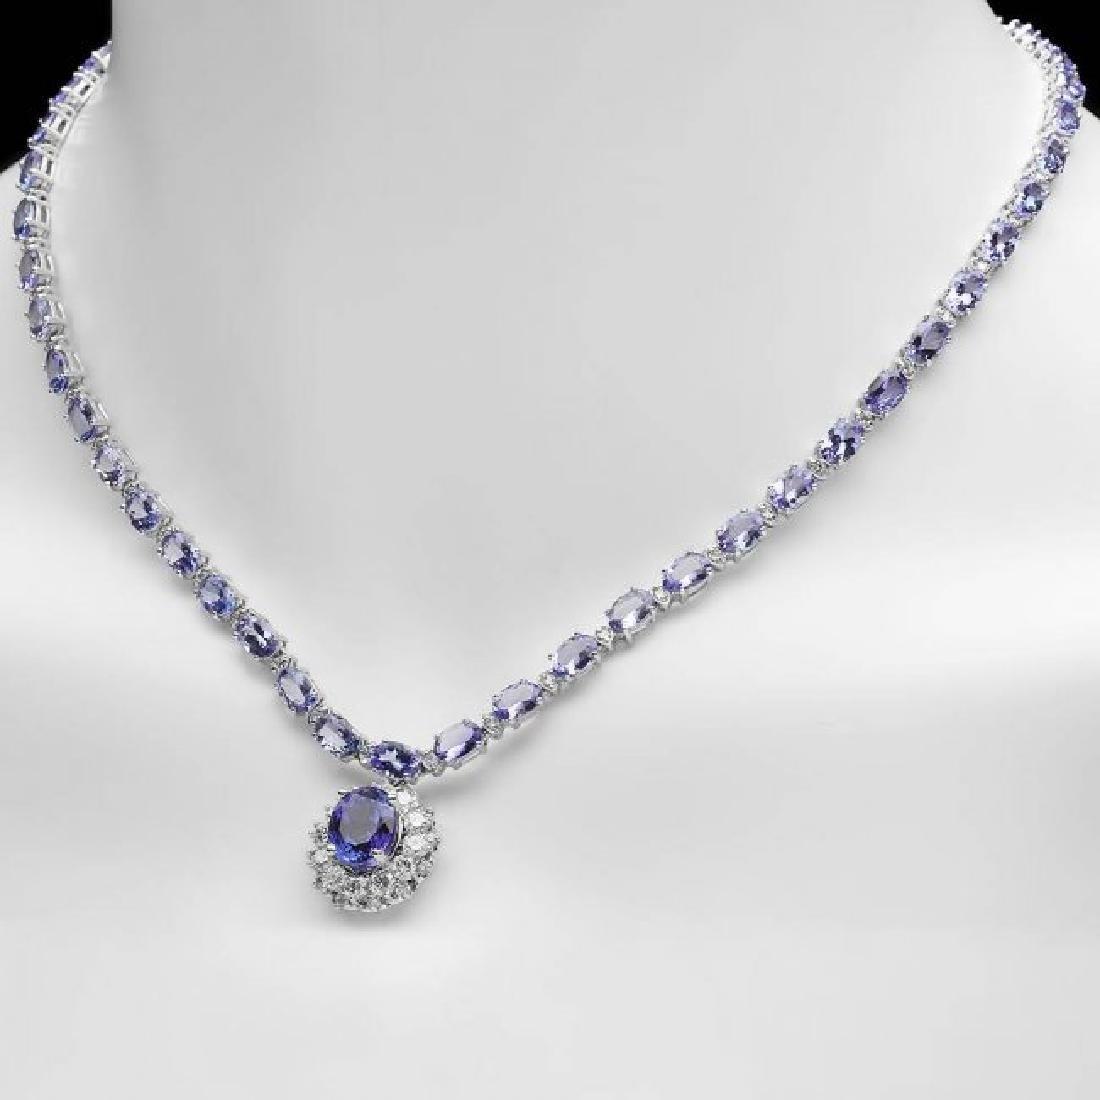 14k Gold 25.5ct Tanzanite 3.00ct Diamond Necklace - 4